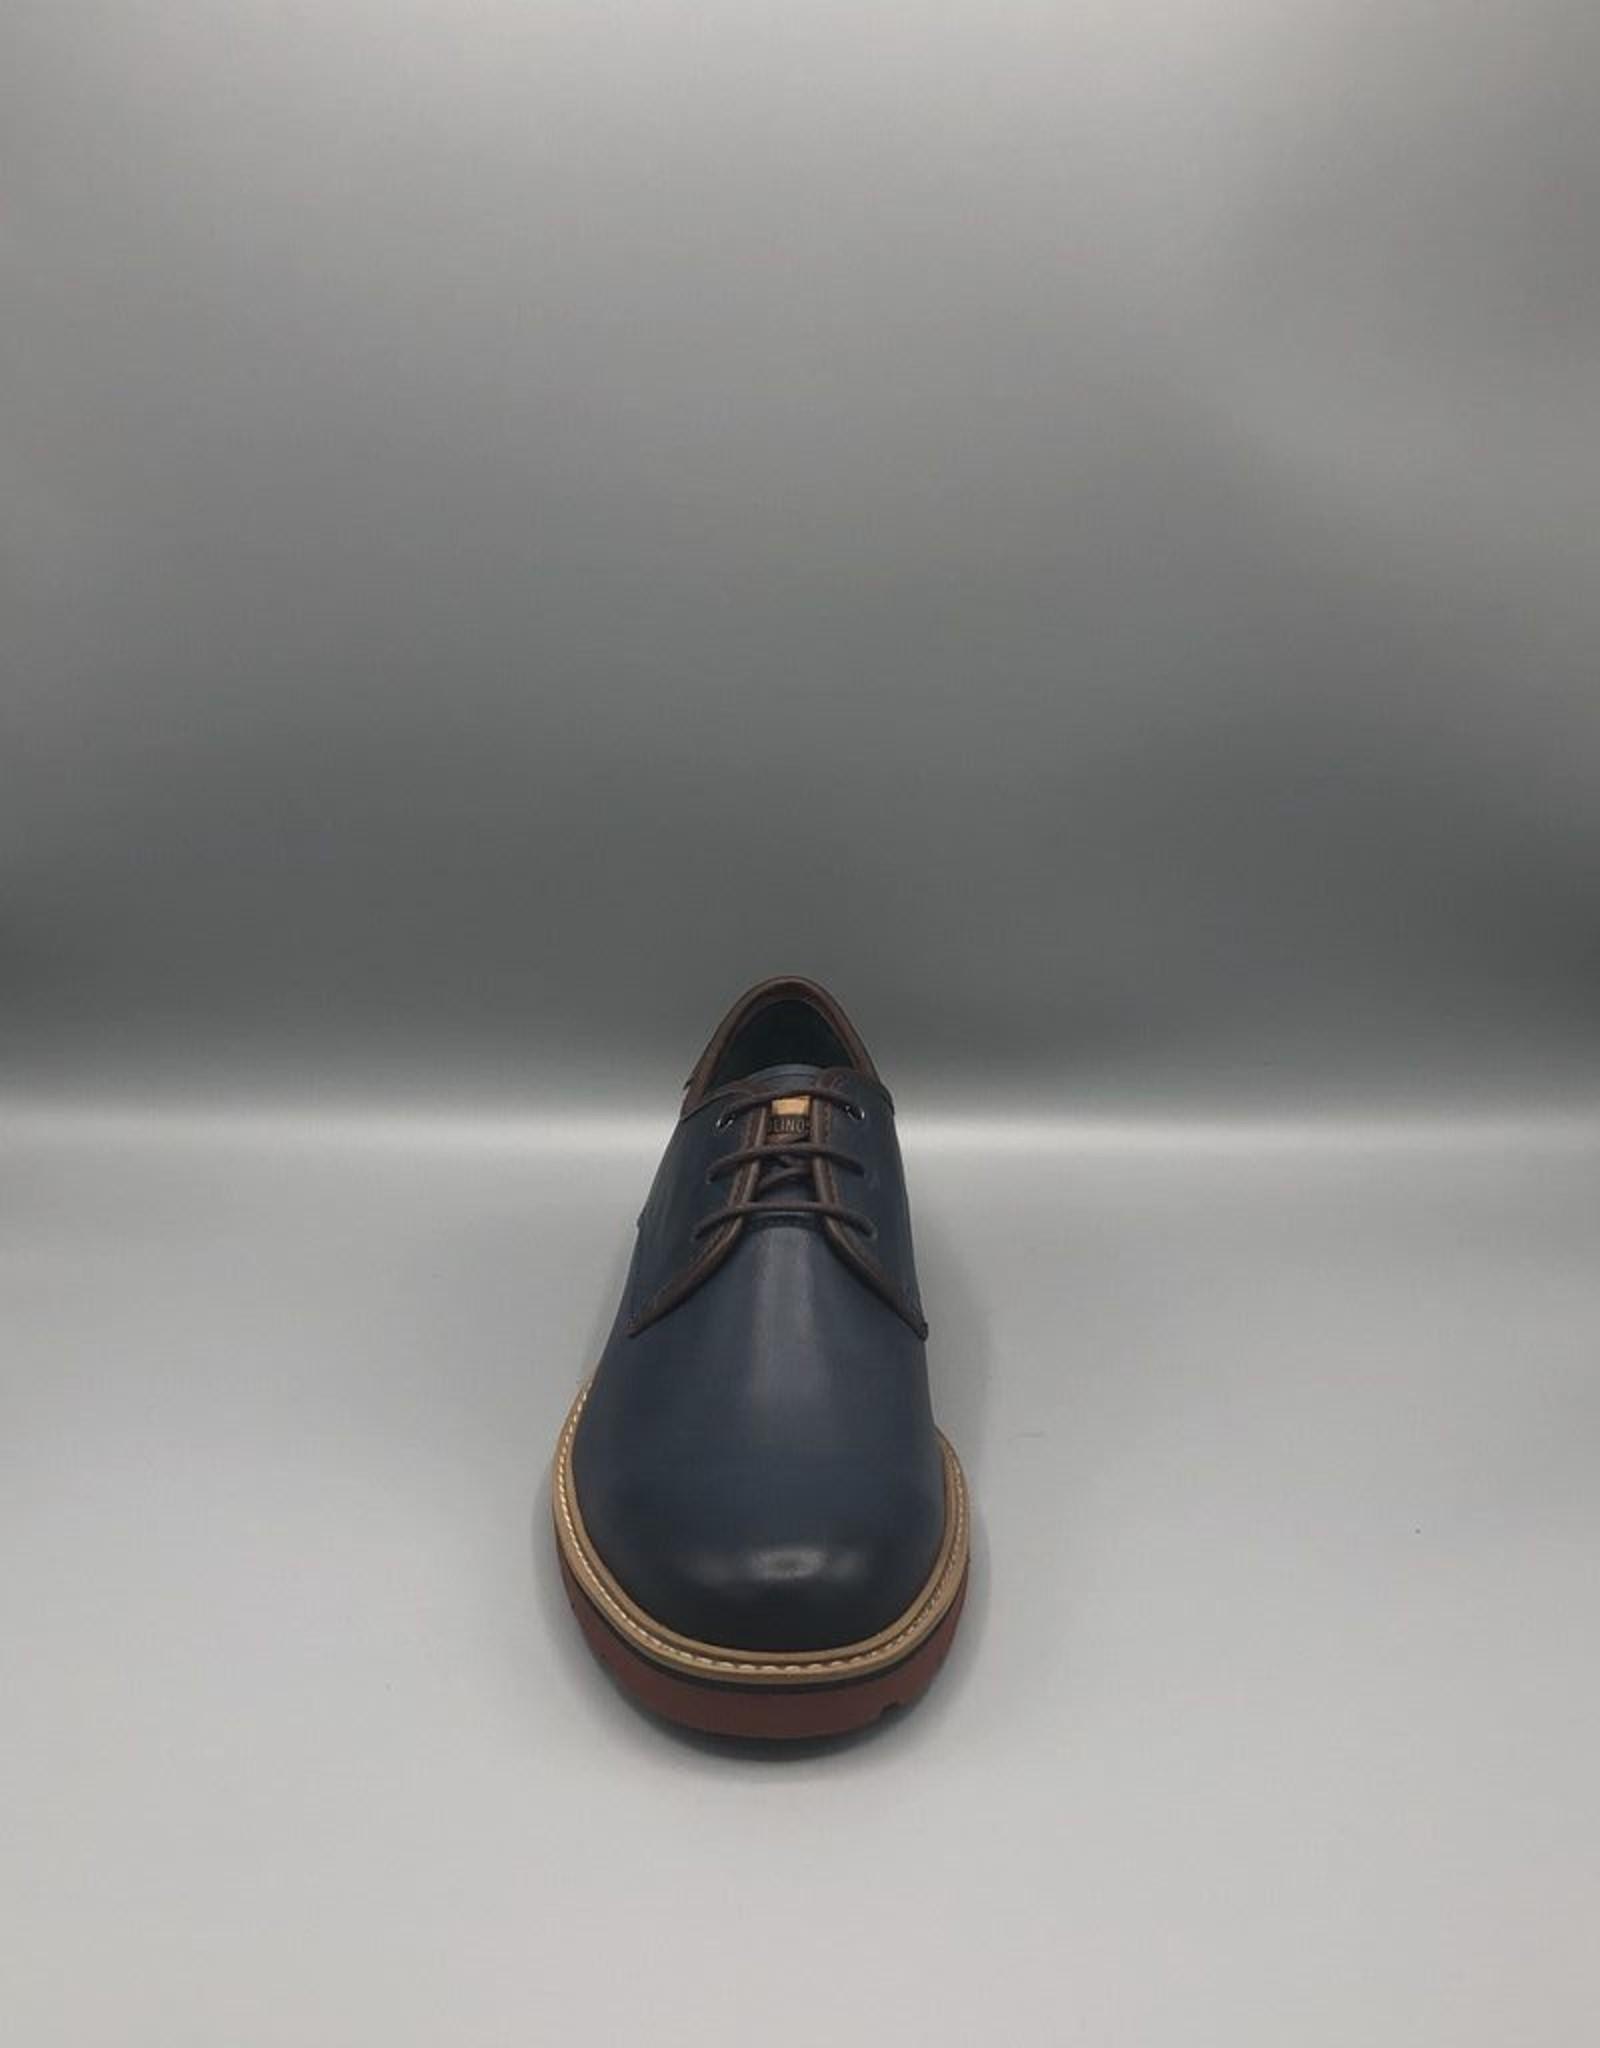 Pikolinos Pikolinos Bilbao Leather Derby Shoe